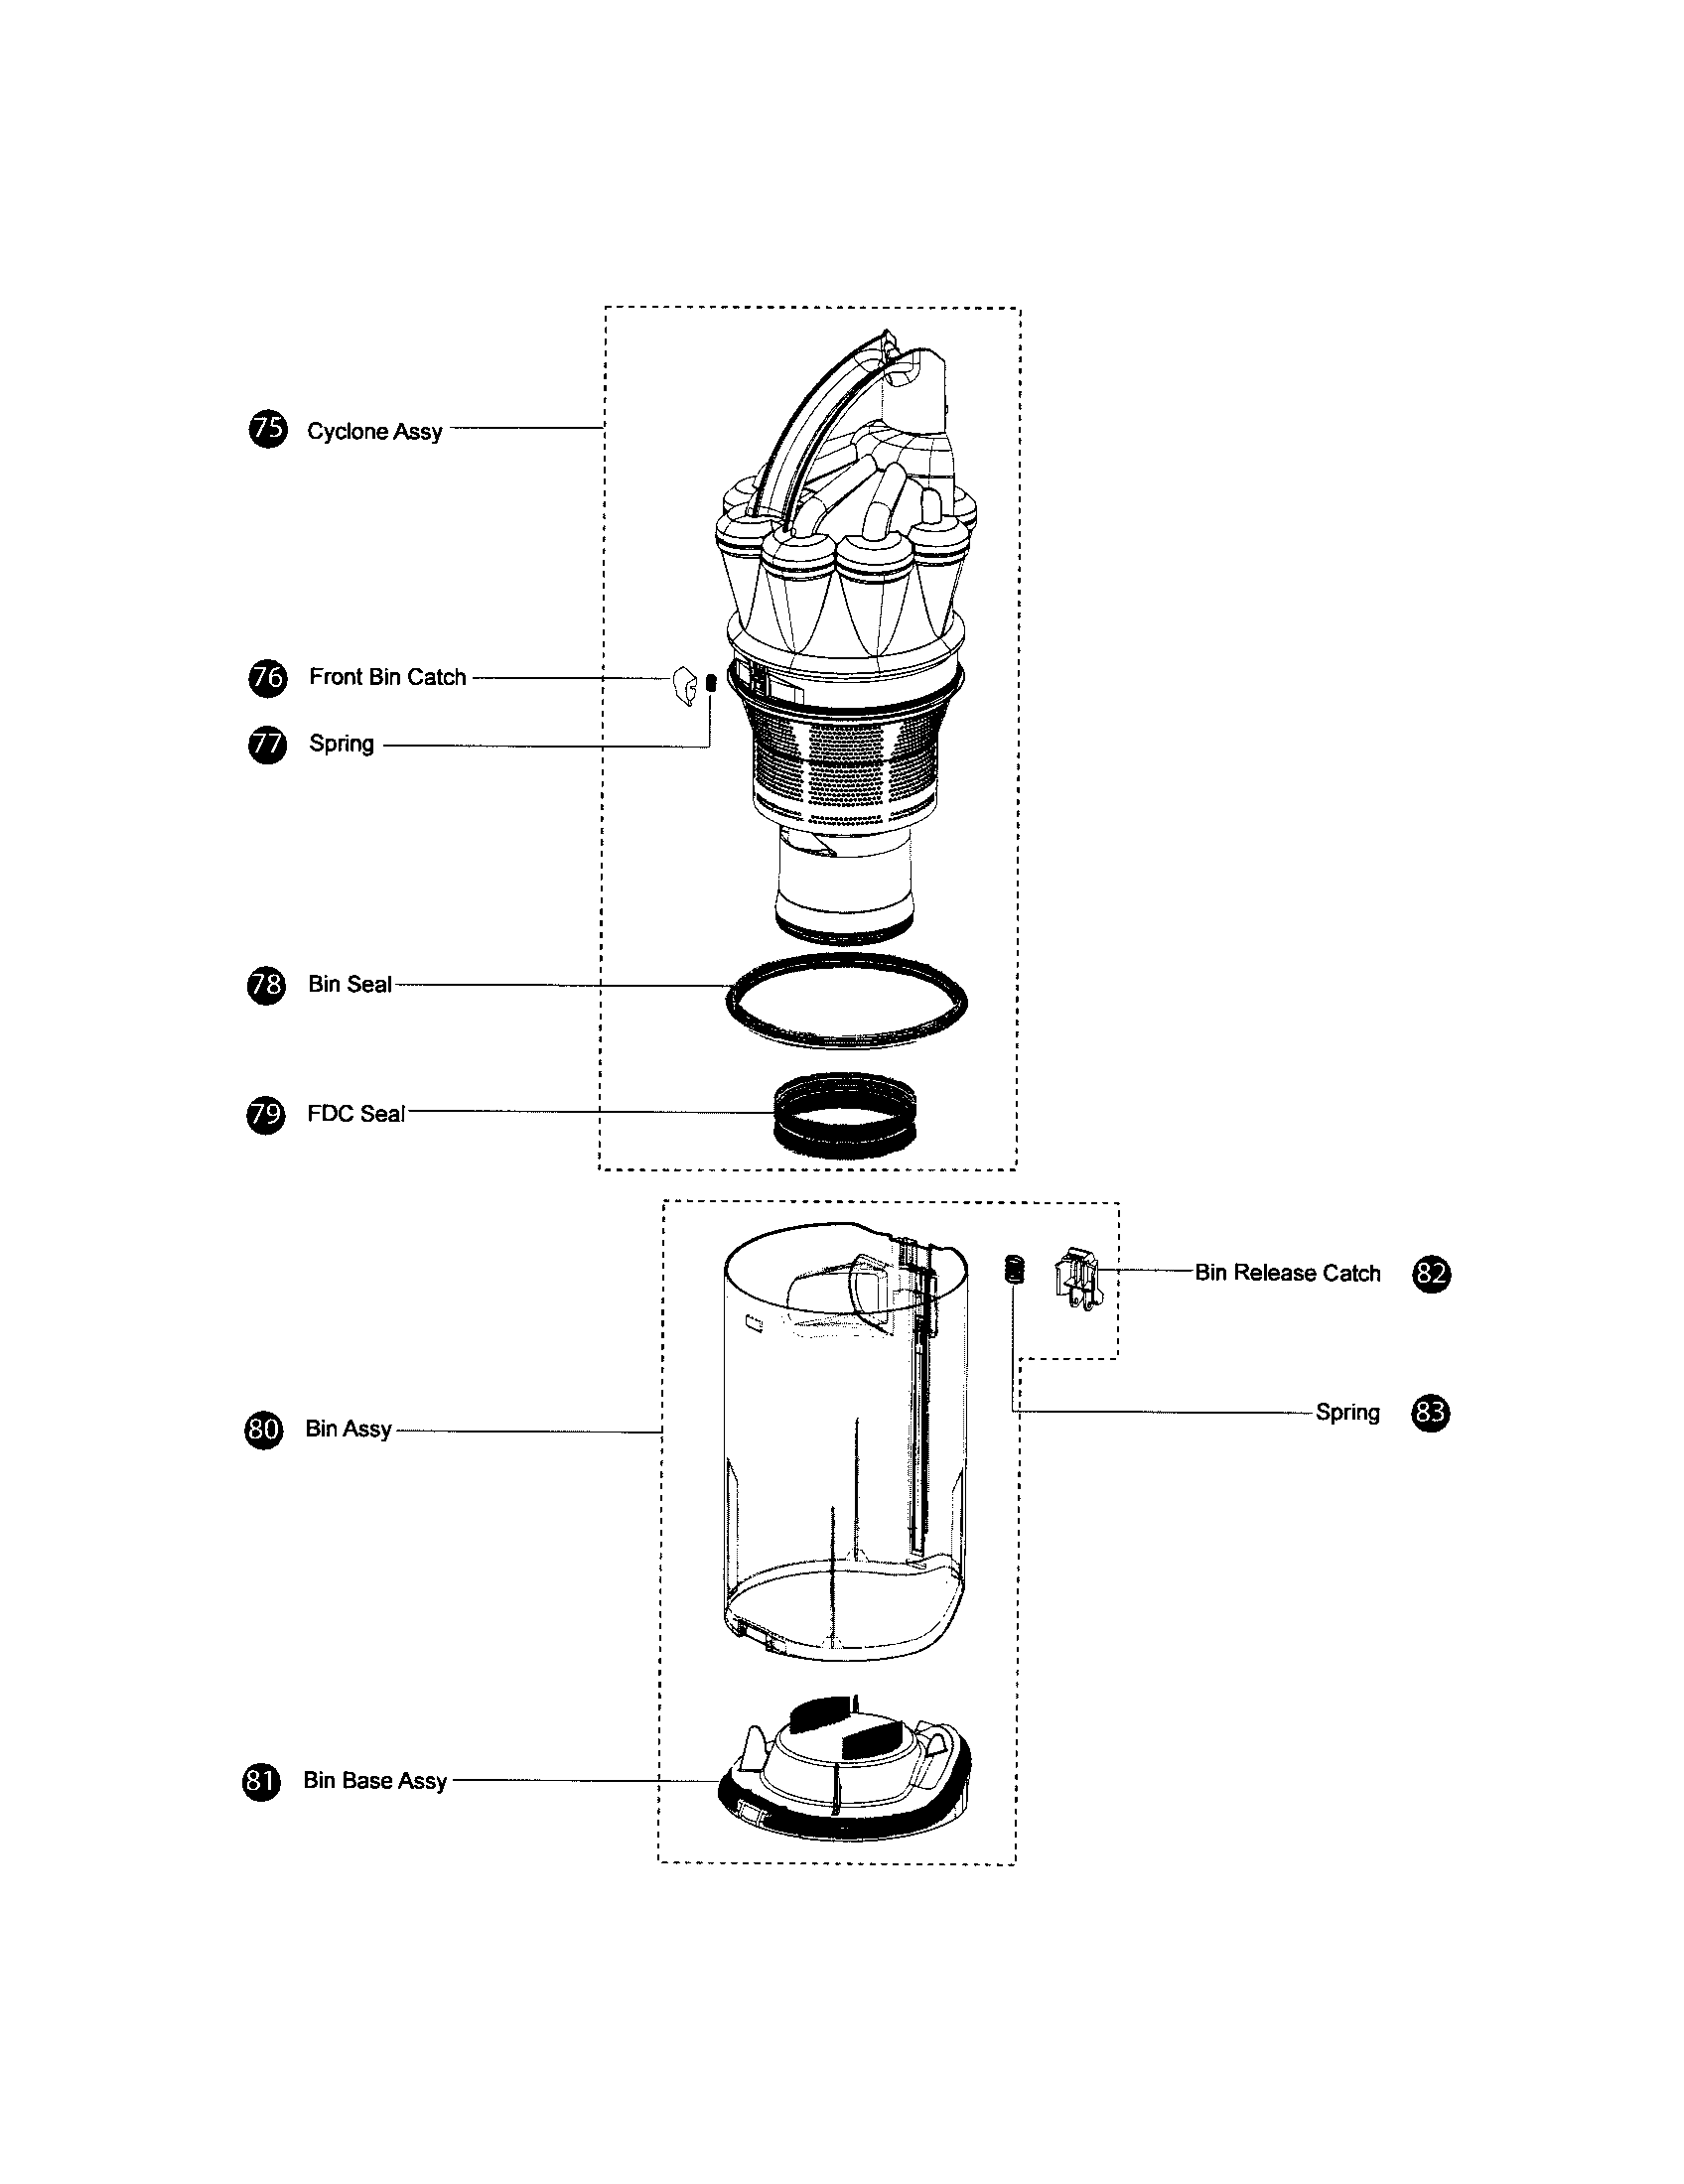 CYCLONE/BIN Diagram & Parts List for Model dc17 Dyson-Inc